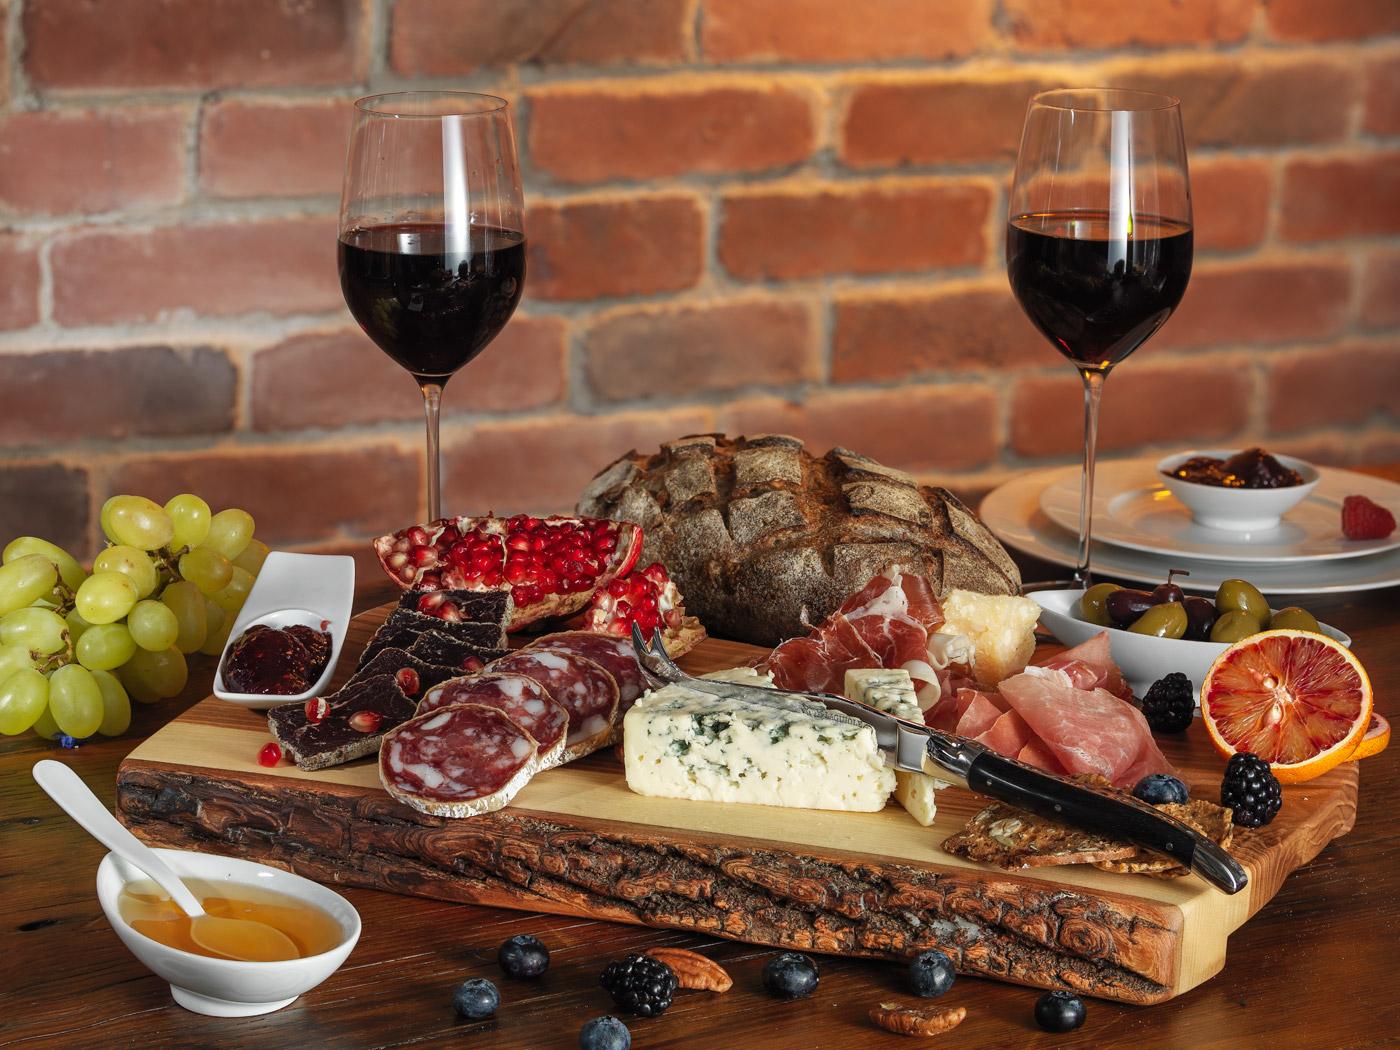 cheese board, food photography, table setup photography, bread board, Montreal food photography